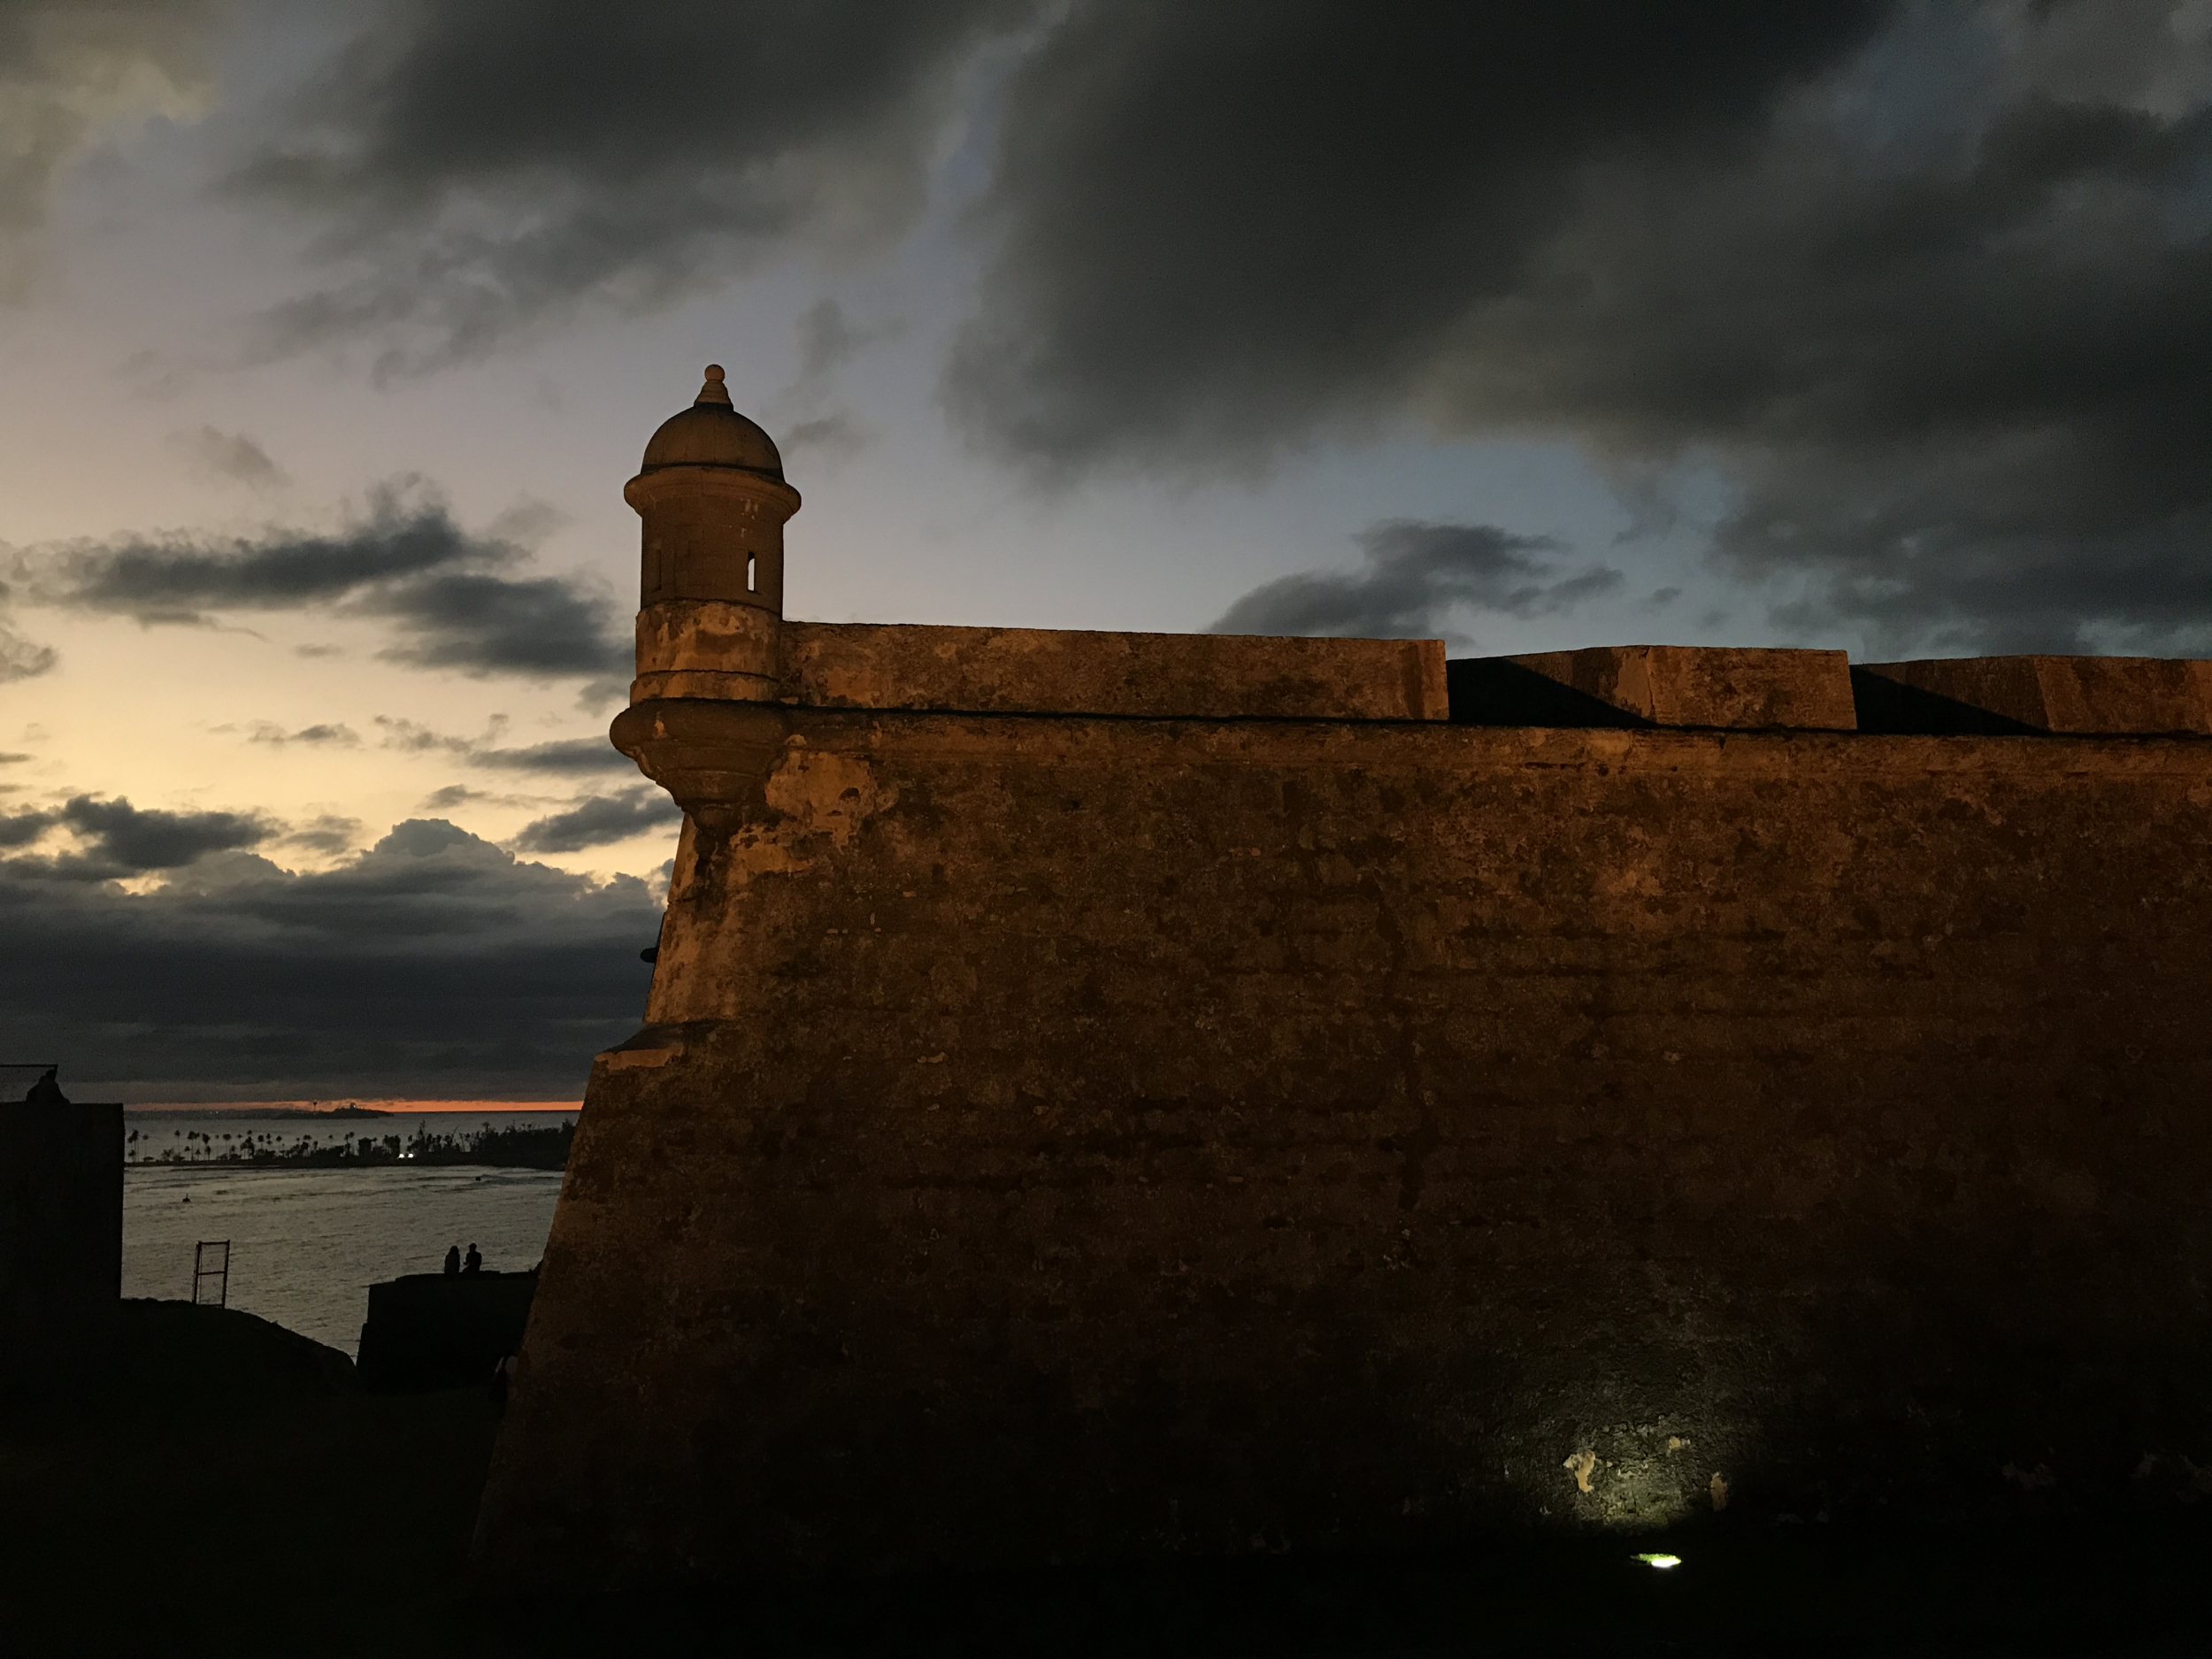 21. El Morro at night